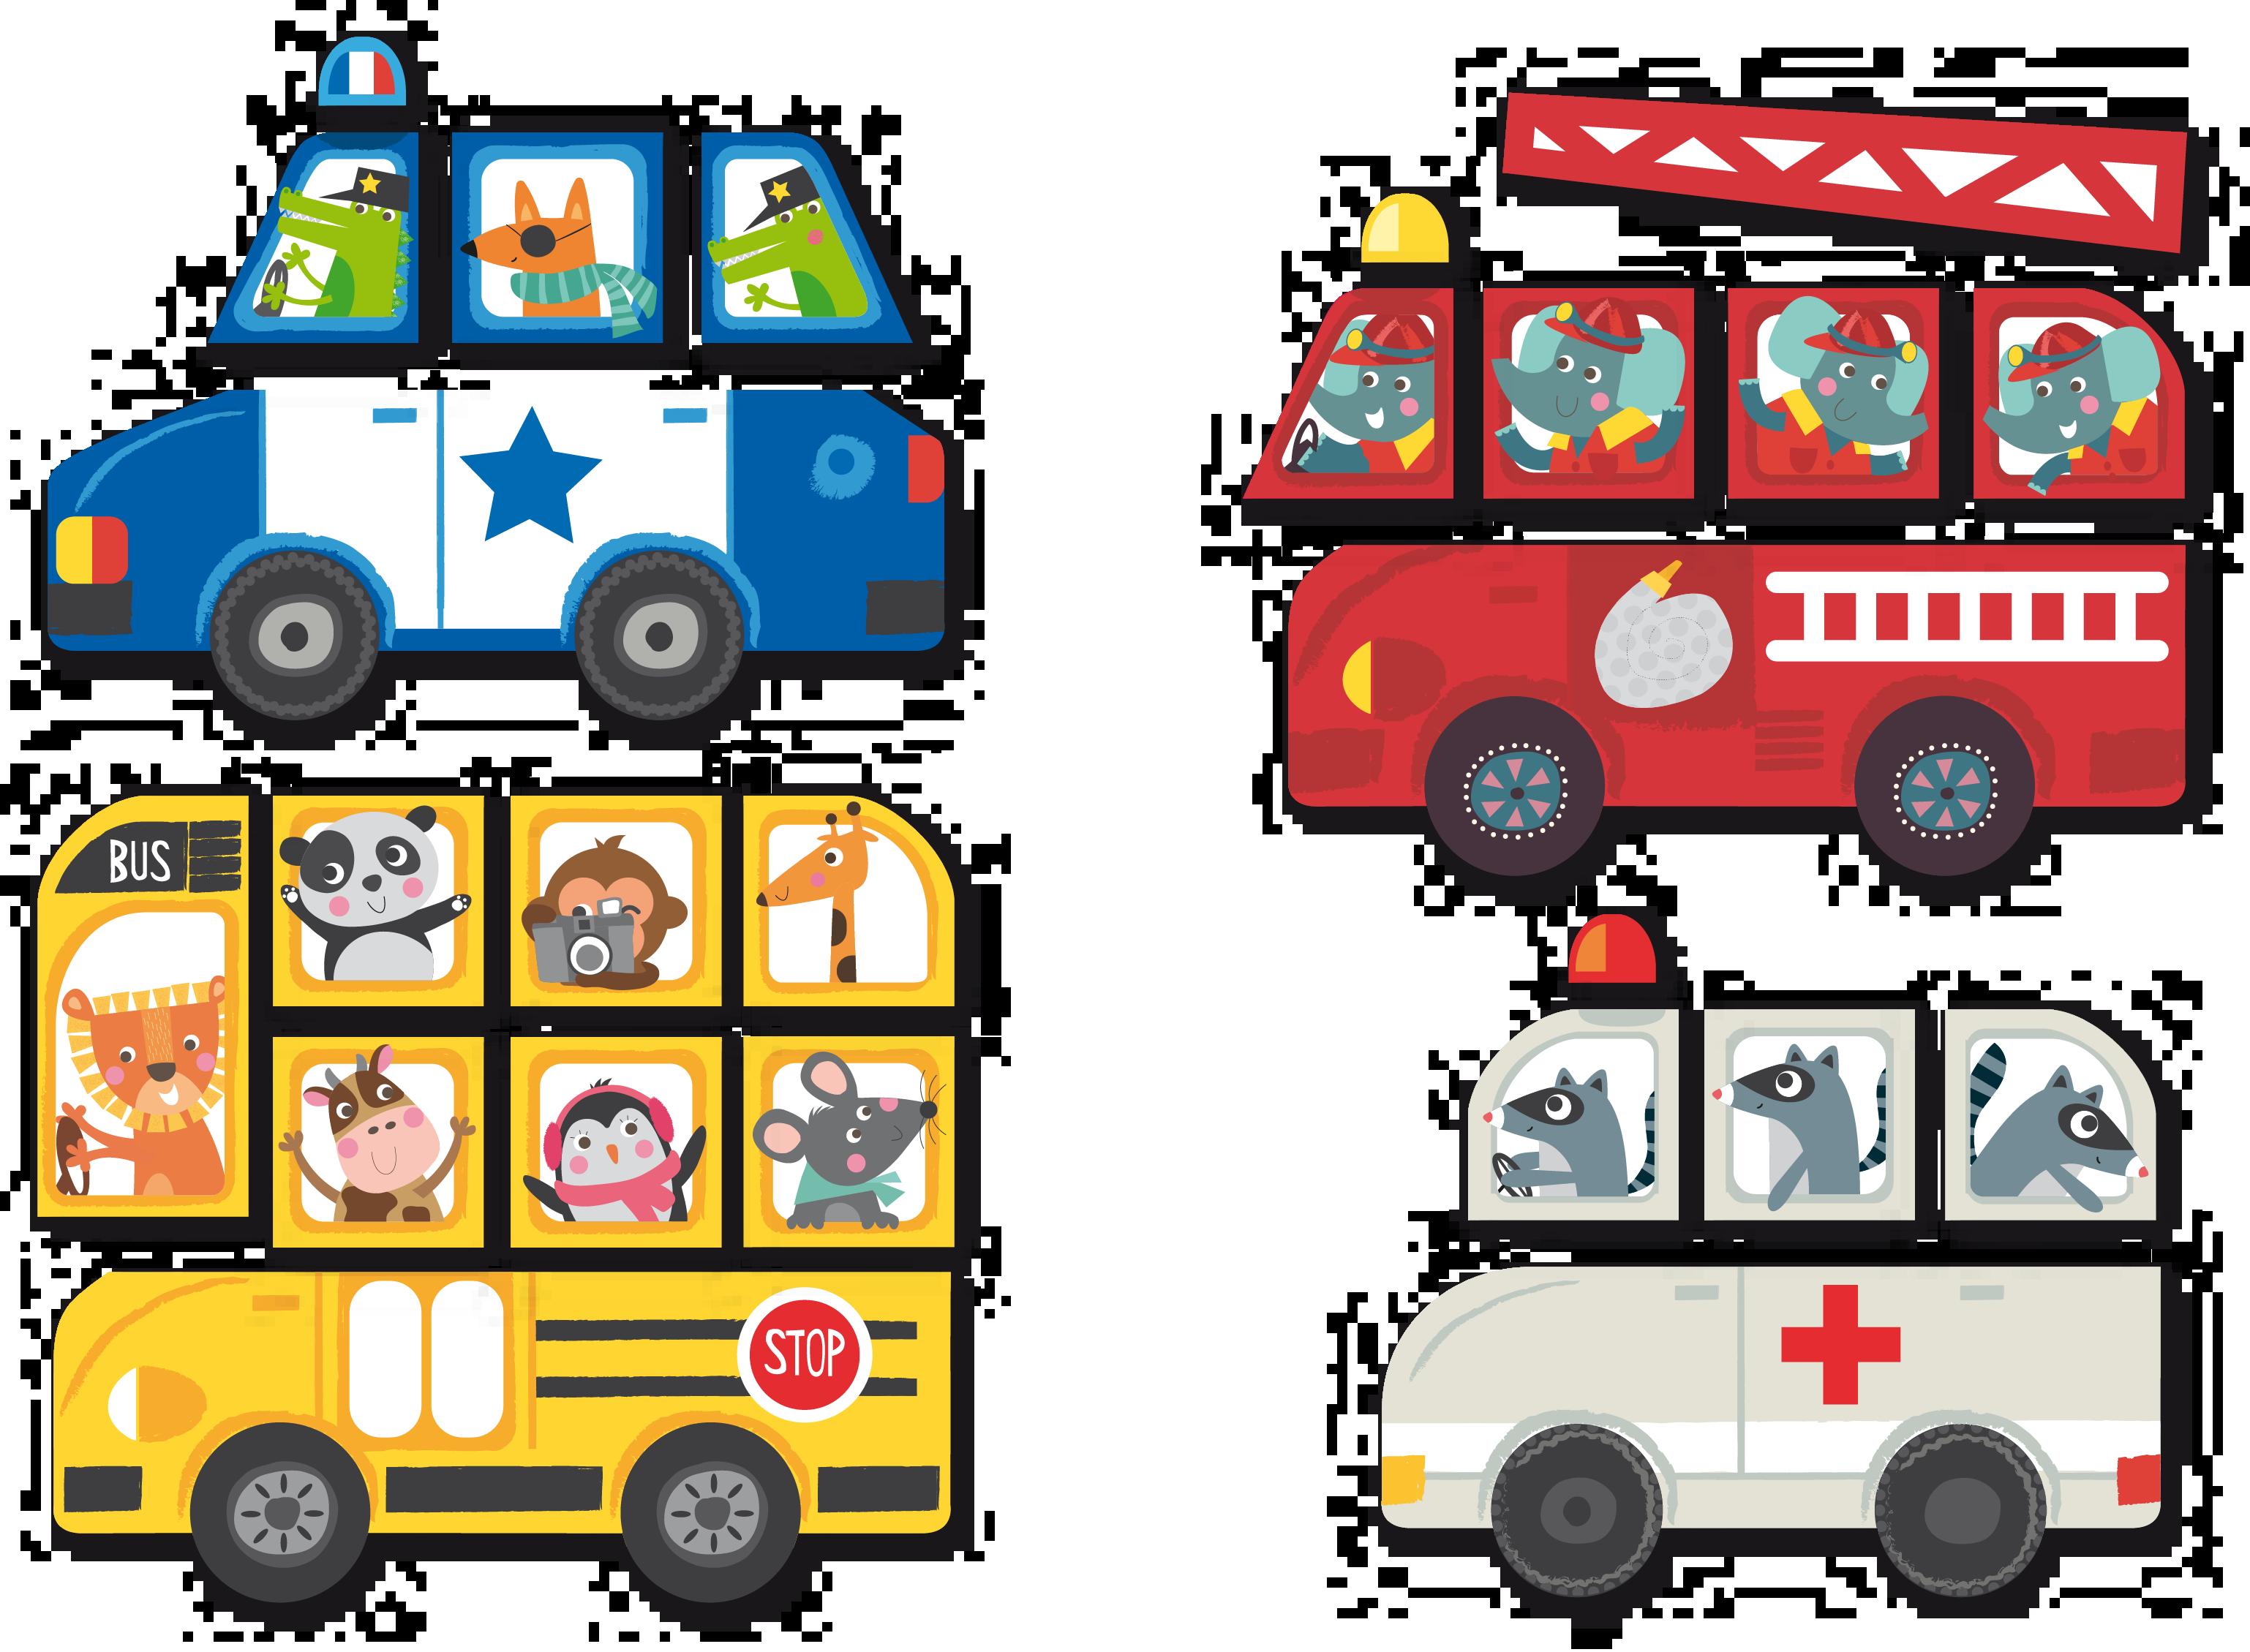 Автомобилите в града - образователна игра с магнити от Apli Kids - образователни играчки(1)-bellamiestore